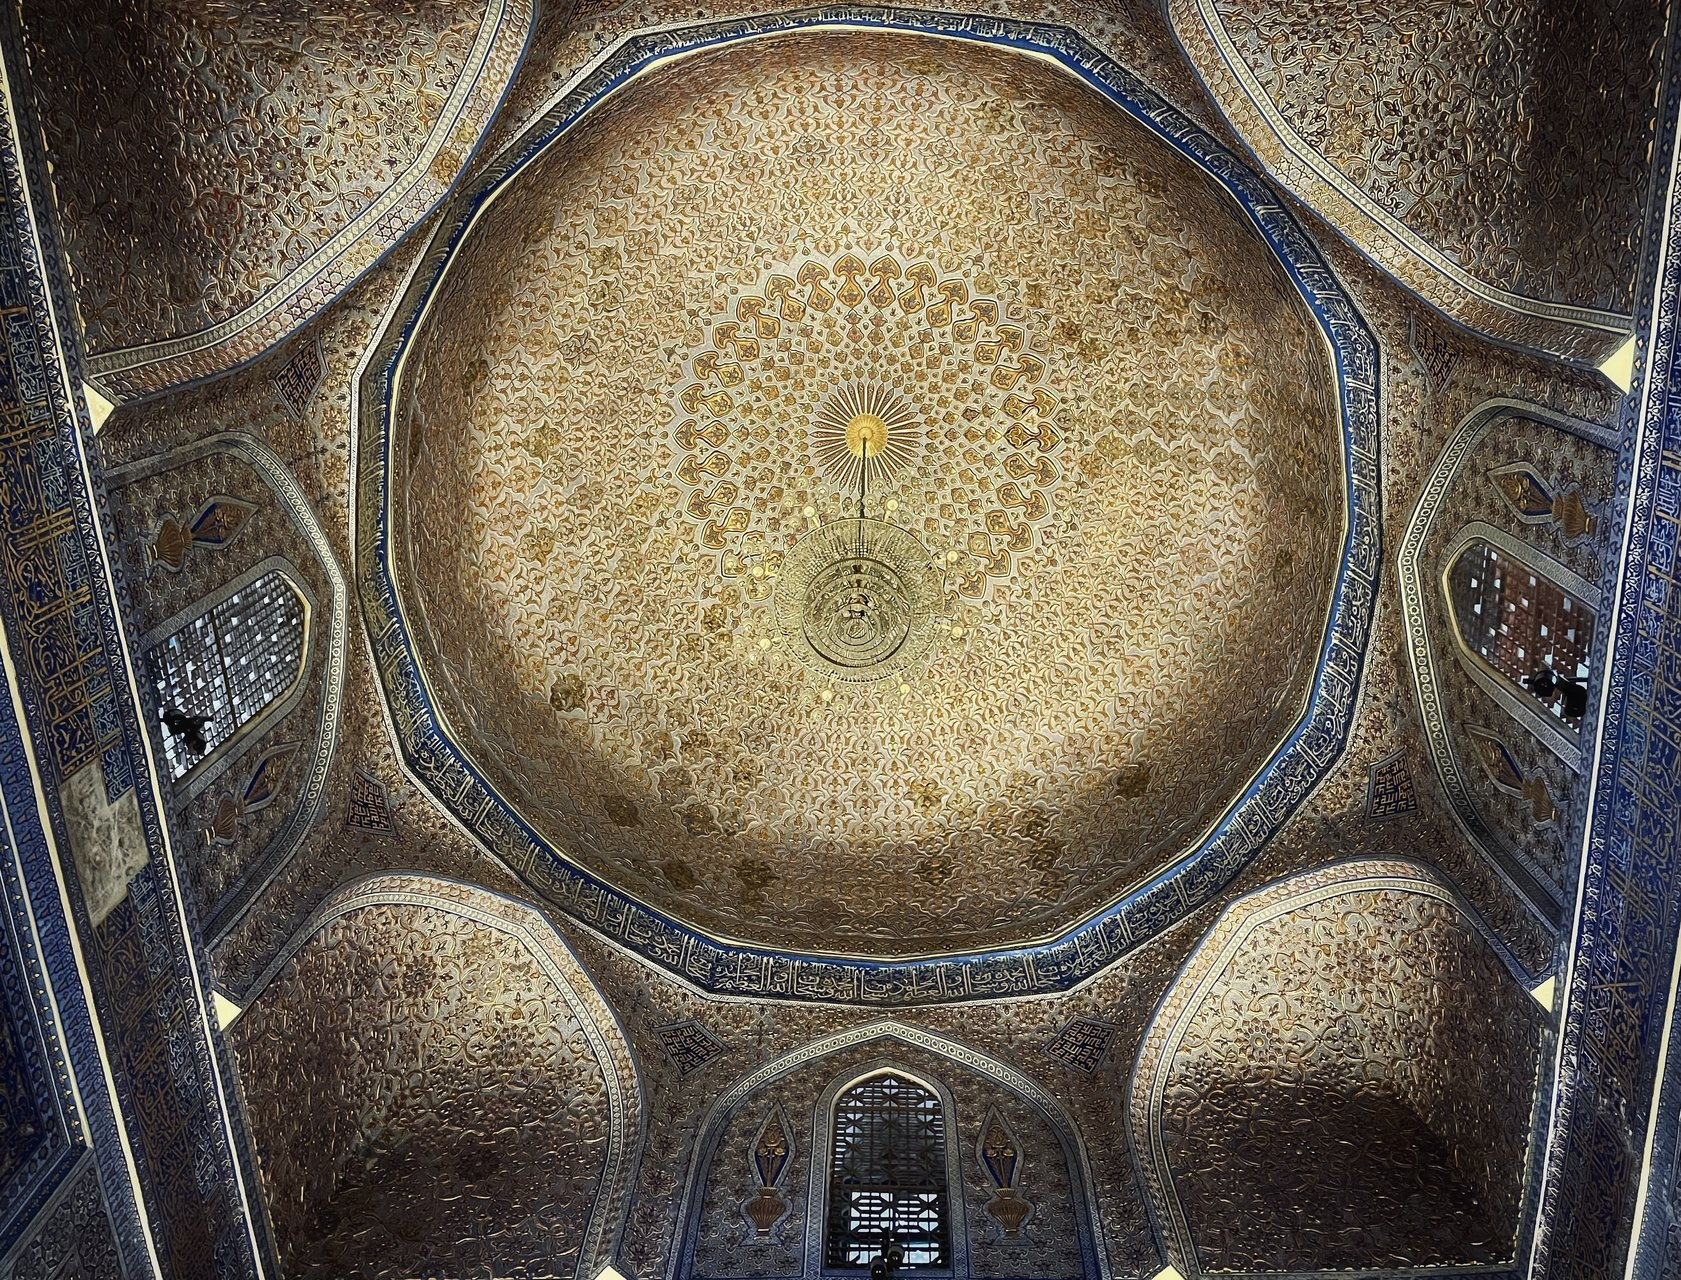 Photo in Architecture | Author Georgi Baychev - sevenseconds | PHOTO FORUM